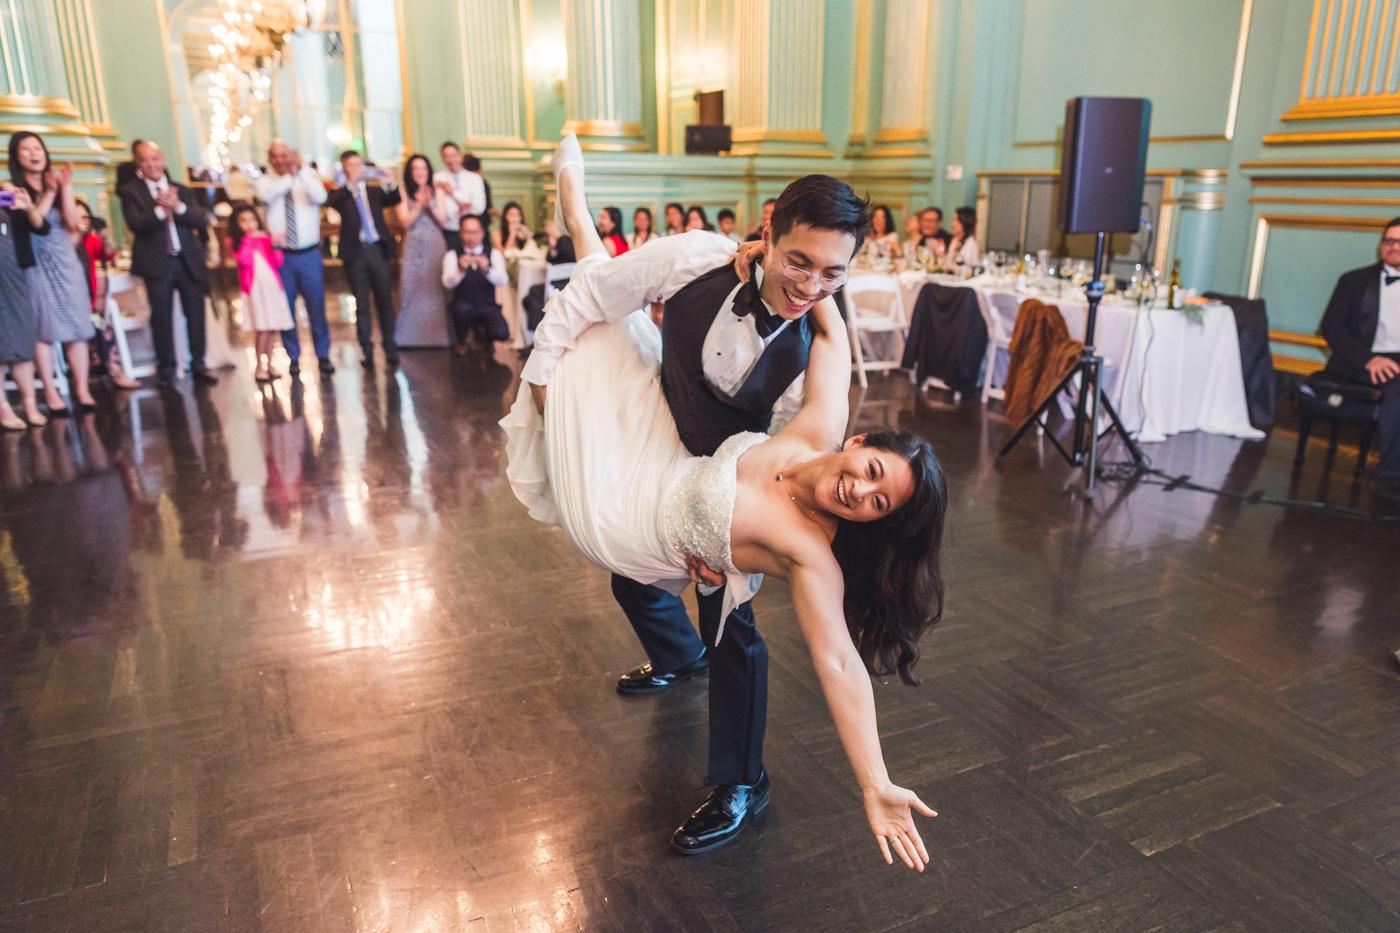 groom-dips-bride-first-dance-green-room-wedding-reception